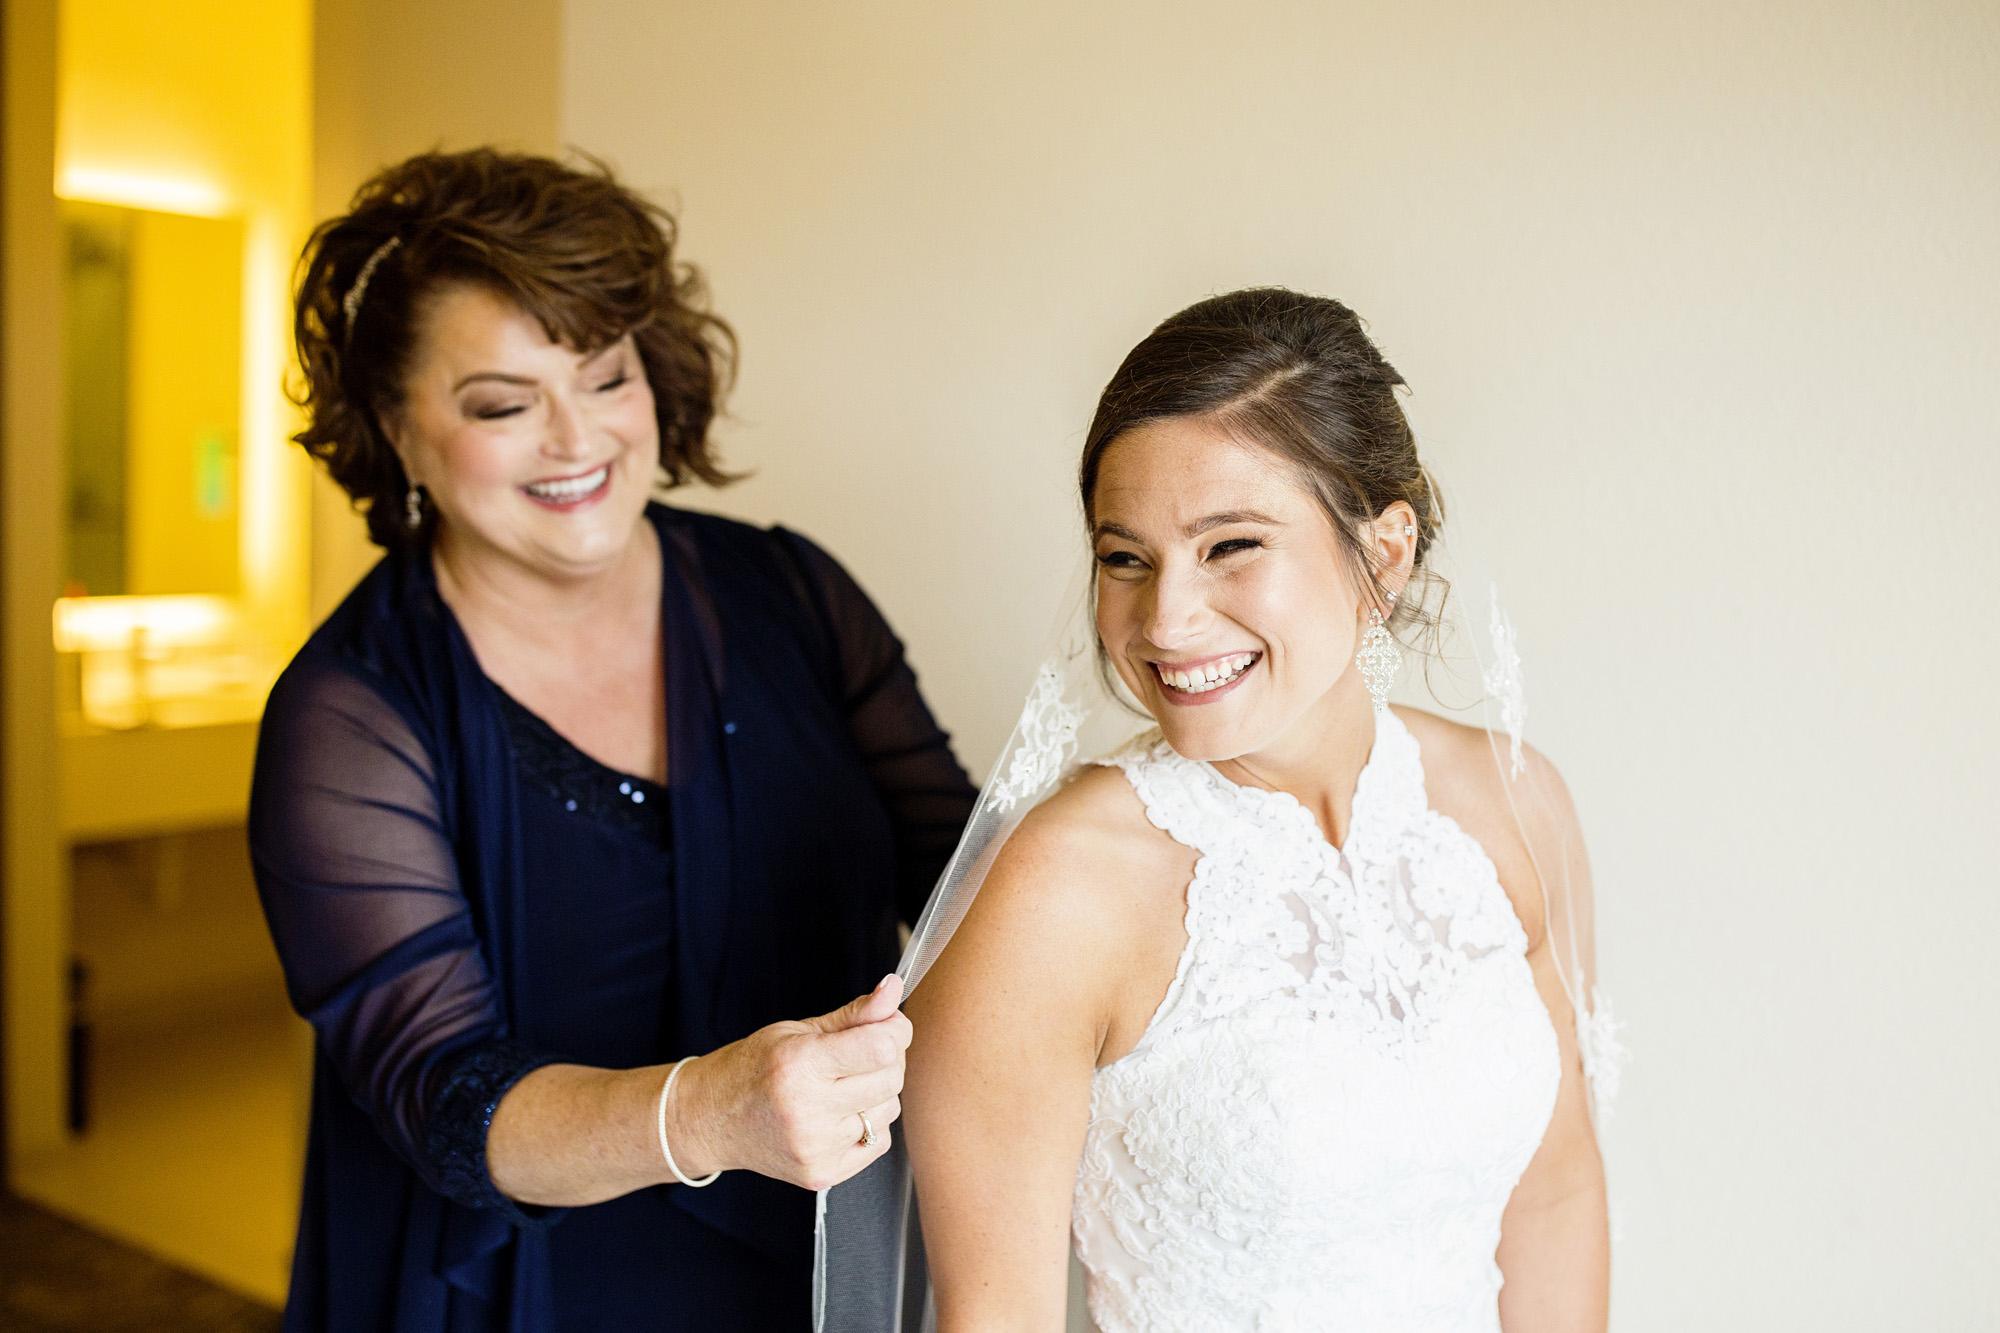 Seriously_Sabrina_Photography_Lexington_Kentucky_Round_Barn_Red_Mile_Stable_of_Memories_Wedding_Hart_19.jpg